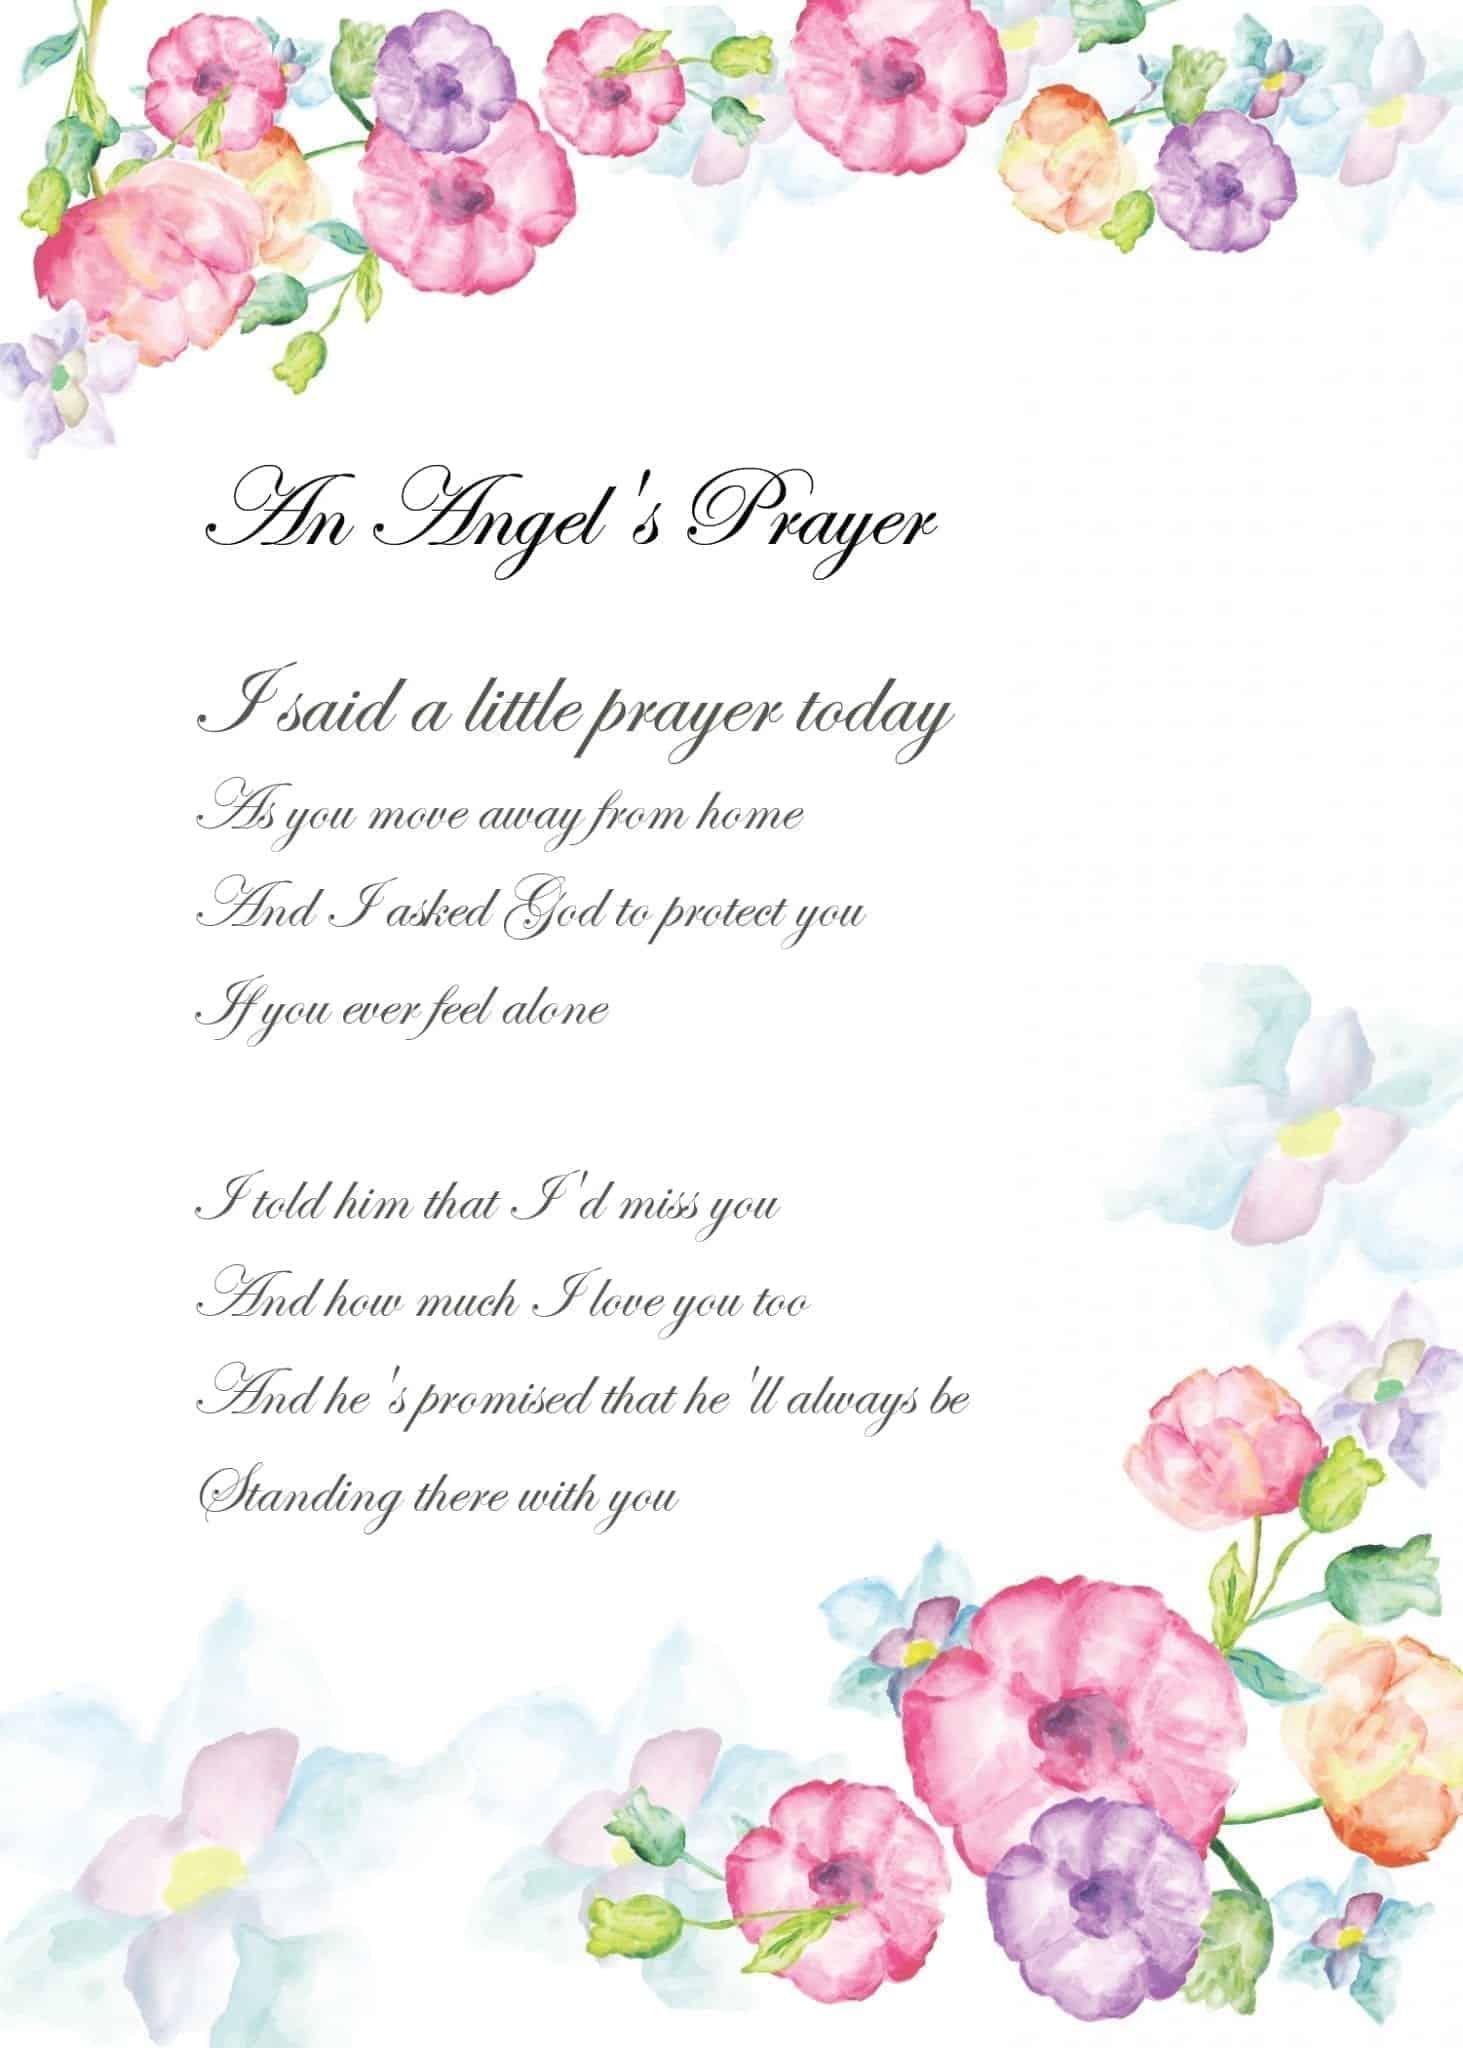 An Angel's Prayer AP8 Home